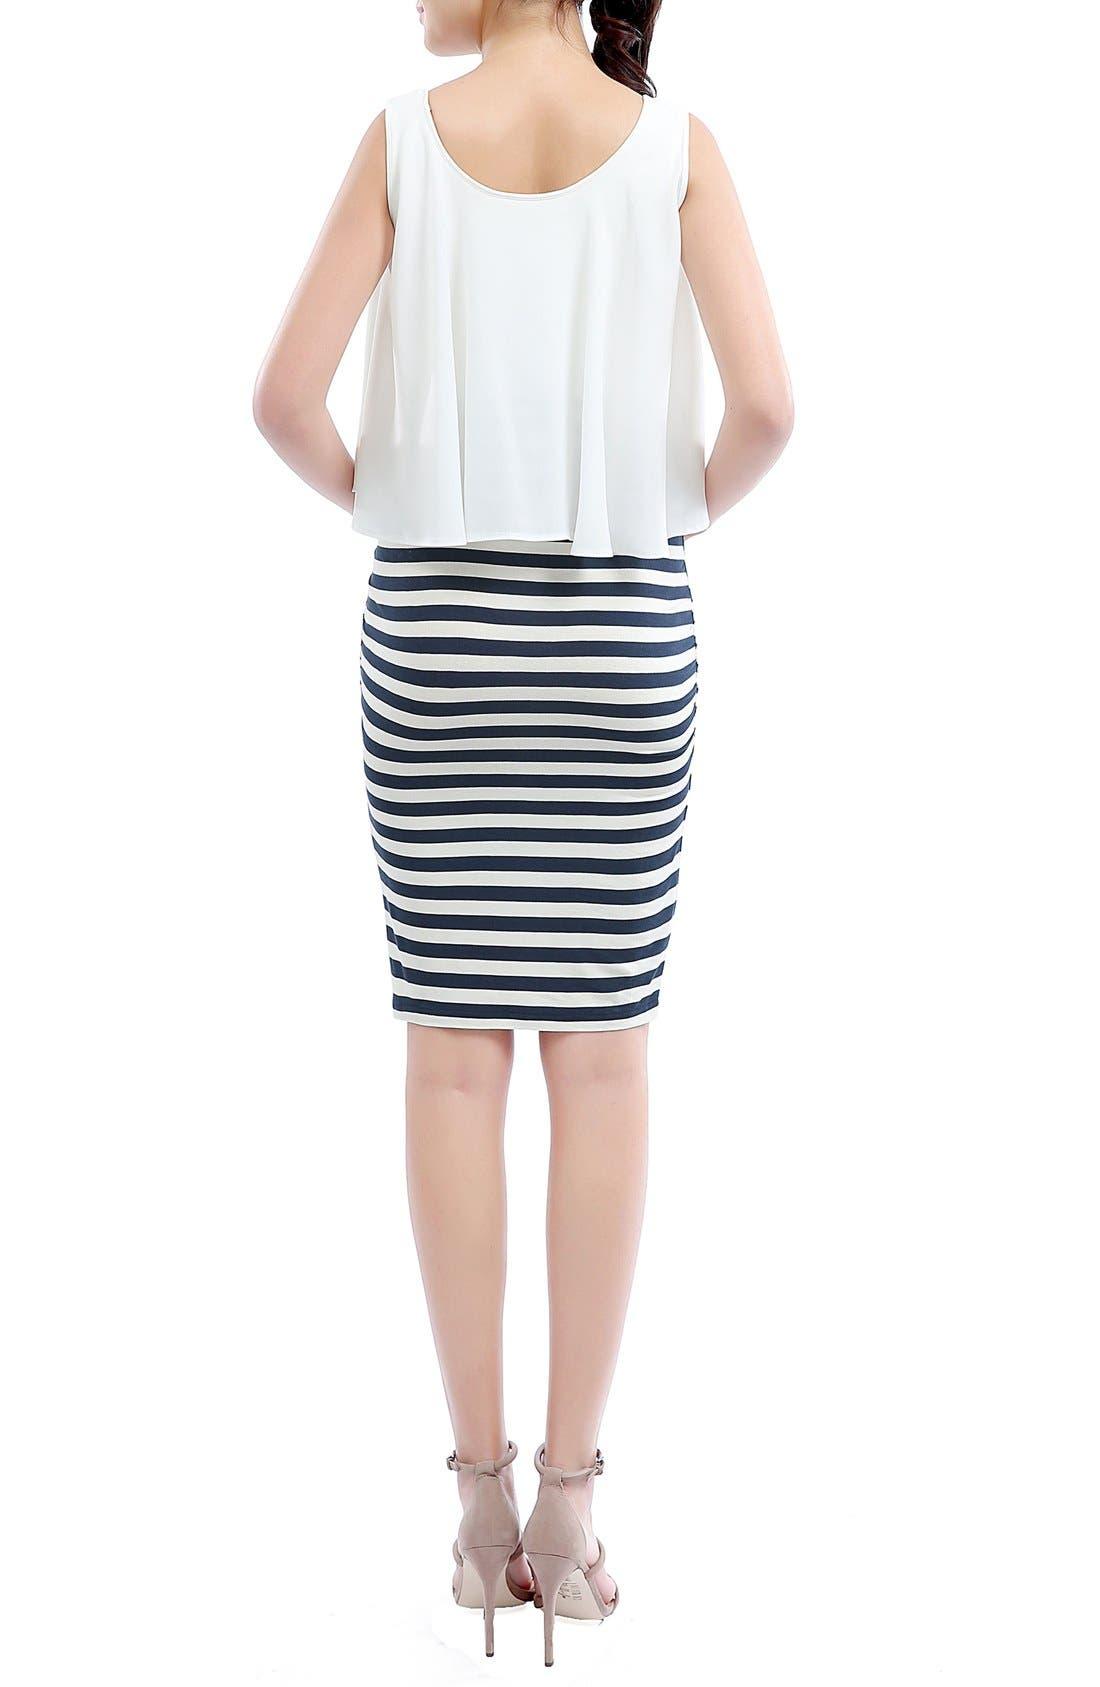 'Anastasia' Popover Maternity Dress,                             Alternate thumbnail 2, color,                             Navy/ Ivory